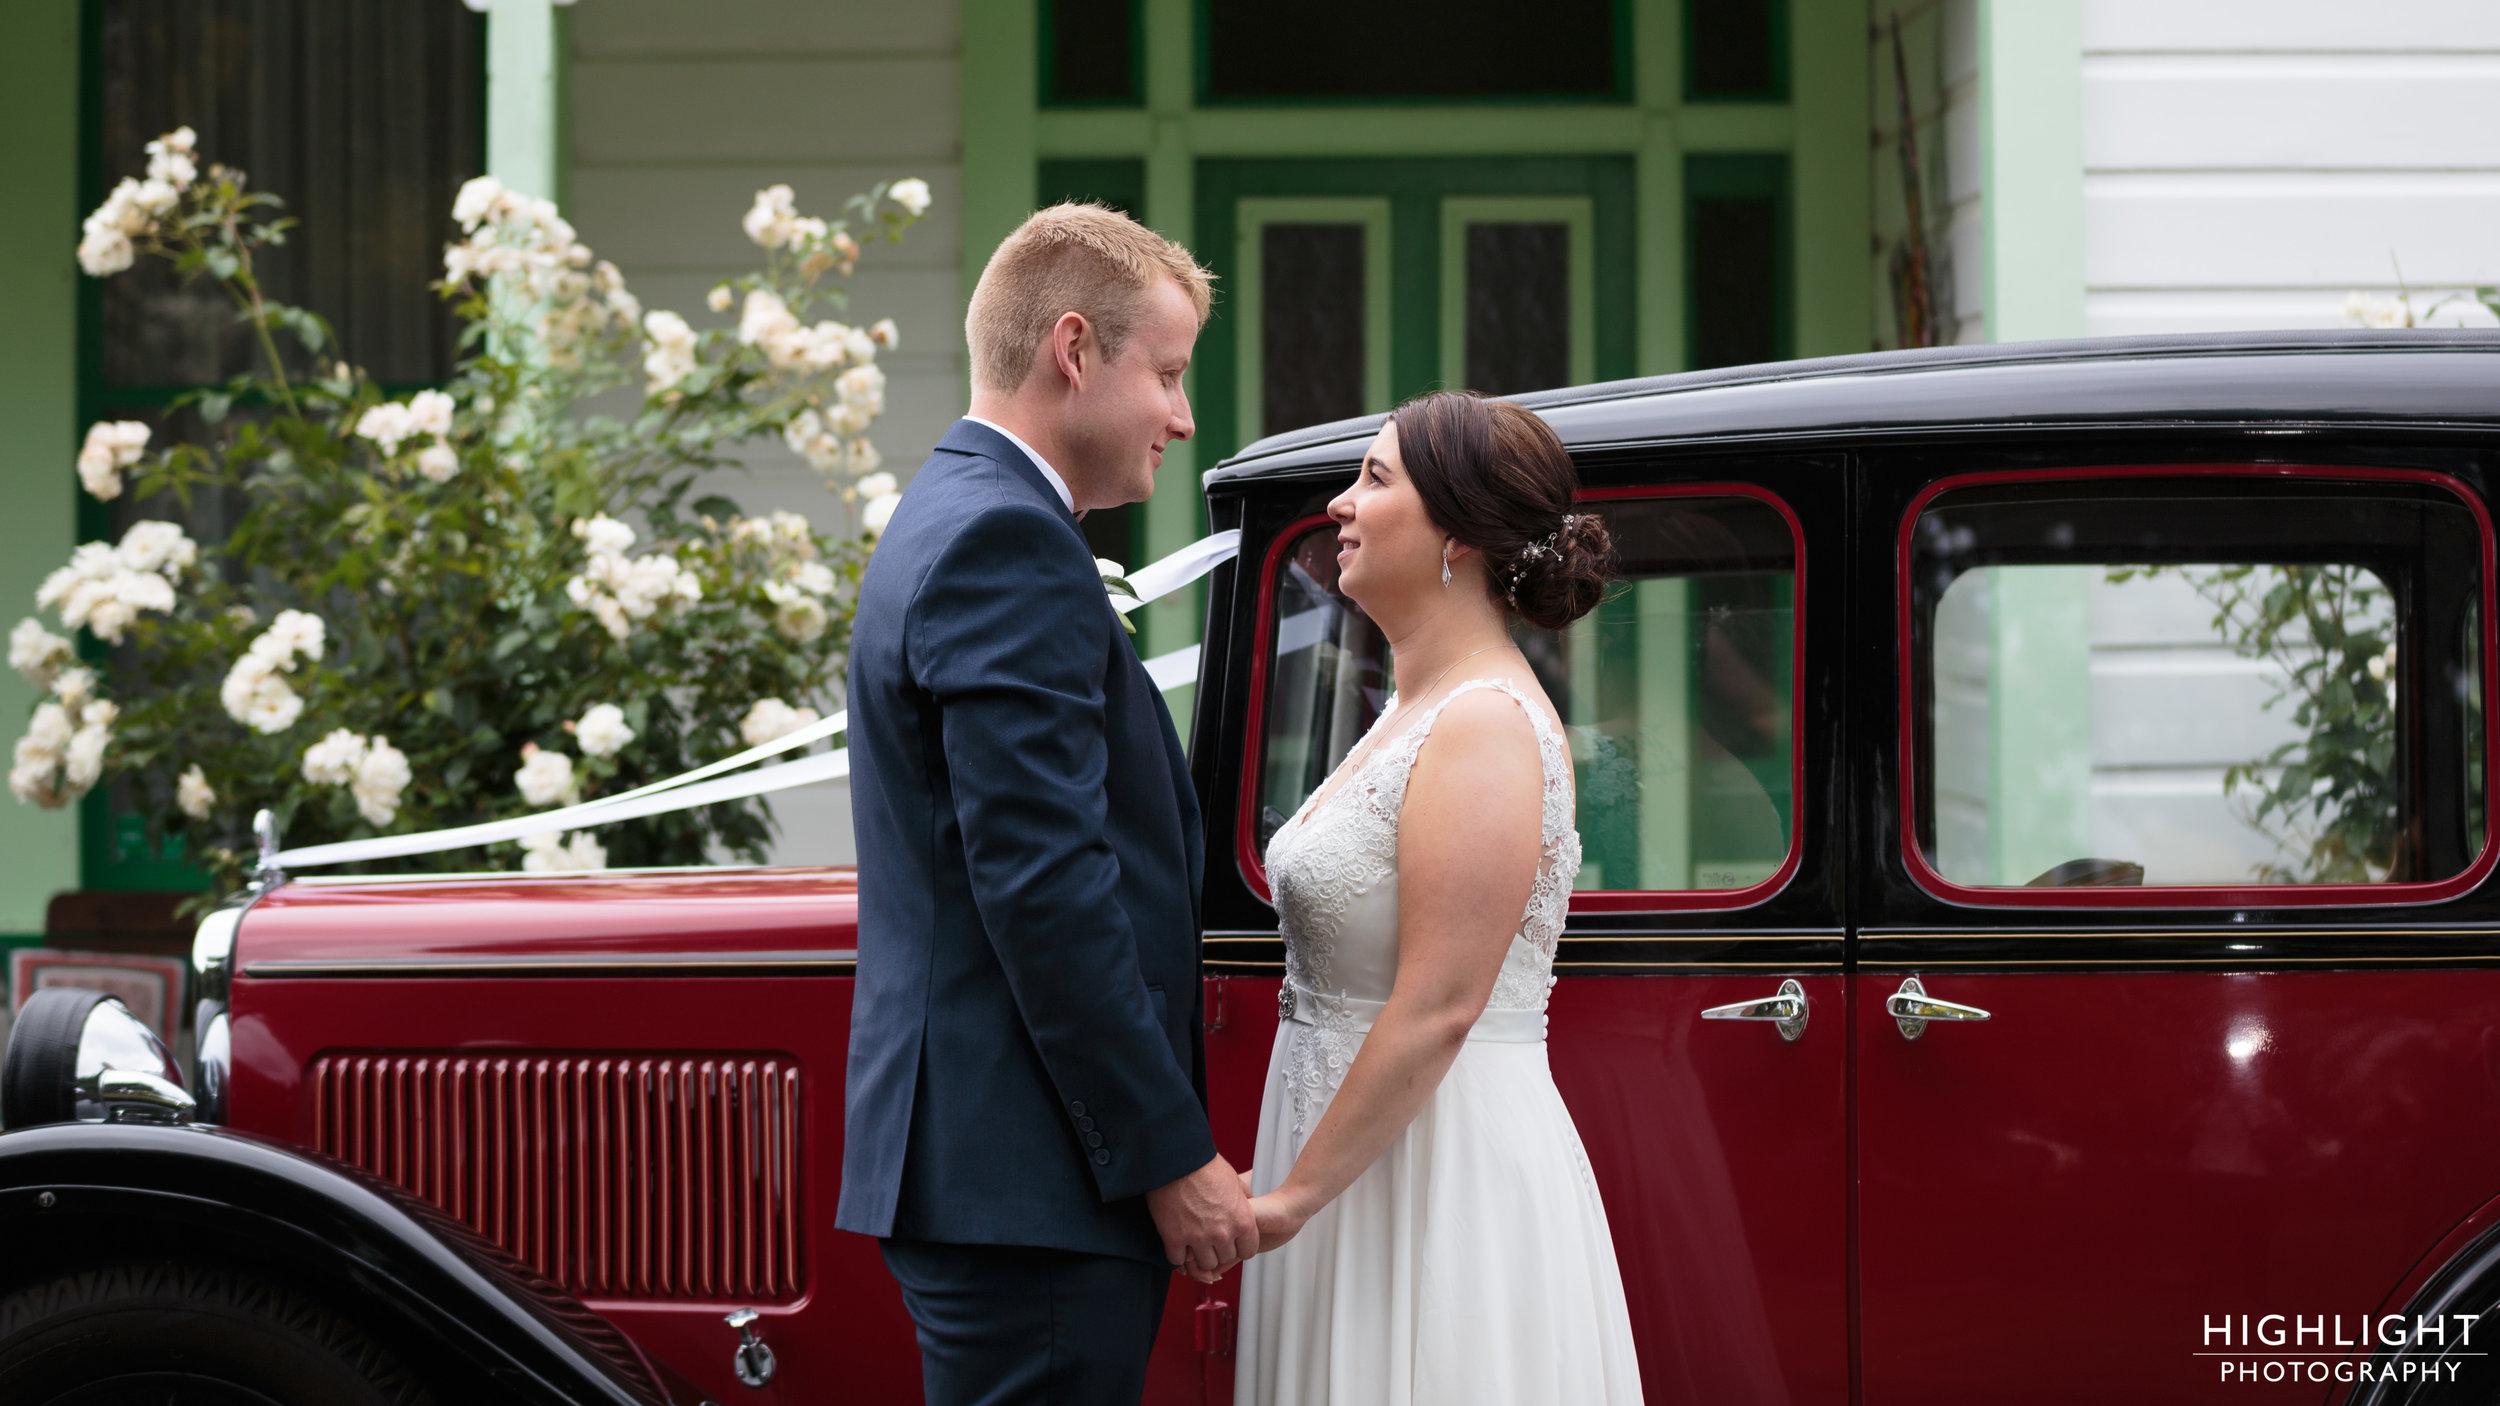 JM-2017-Highlight-wedding-photography-palmerston-north-new-zealand-146.jpg